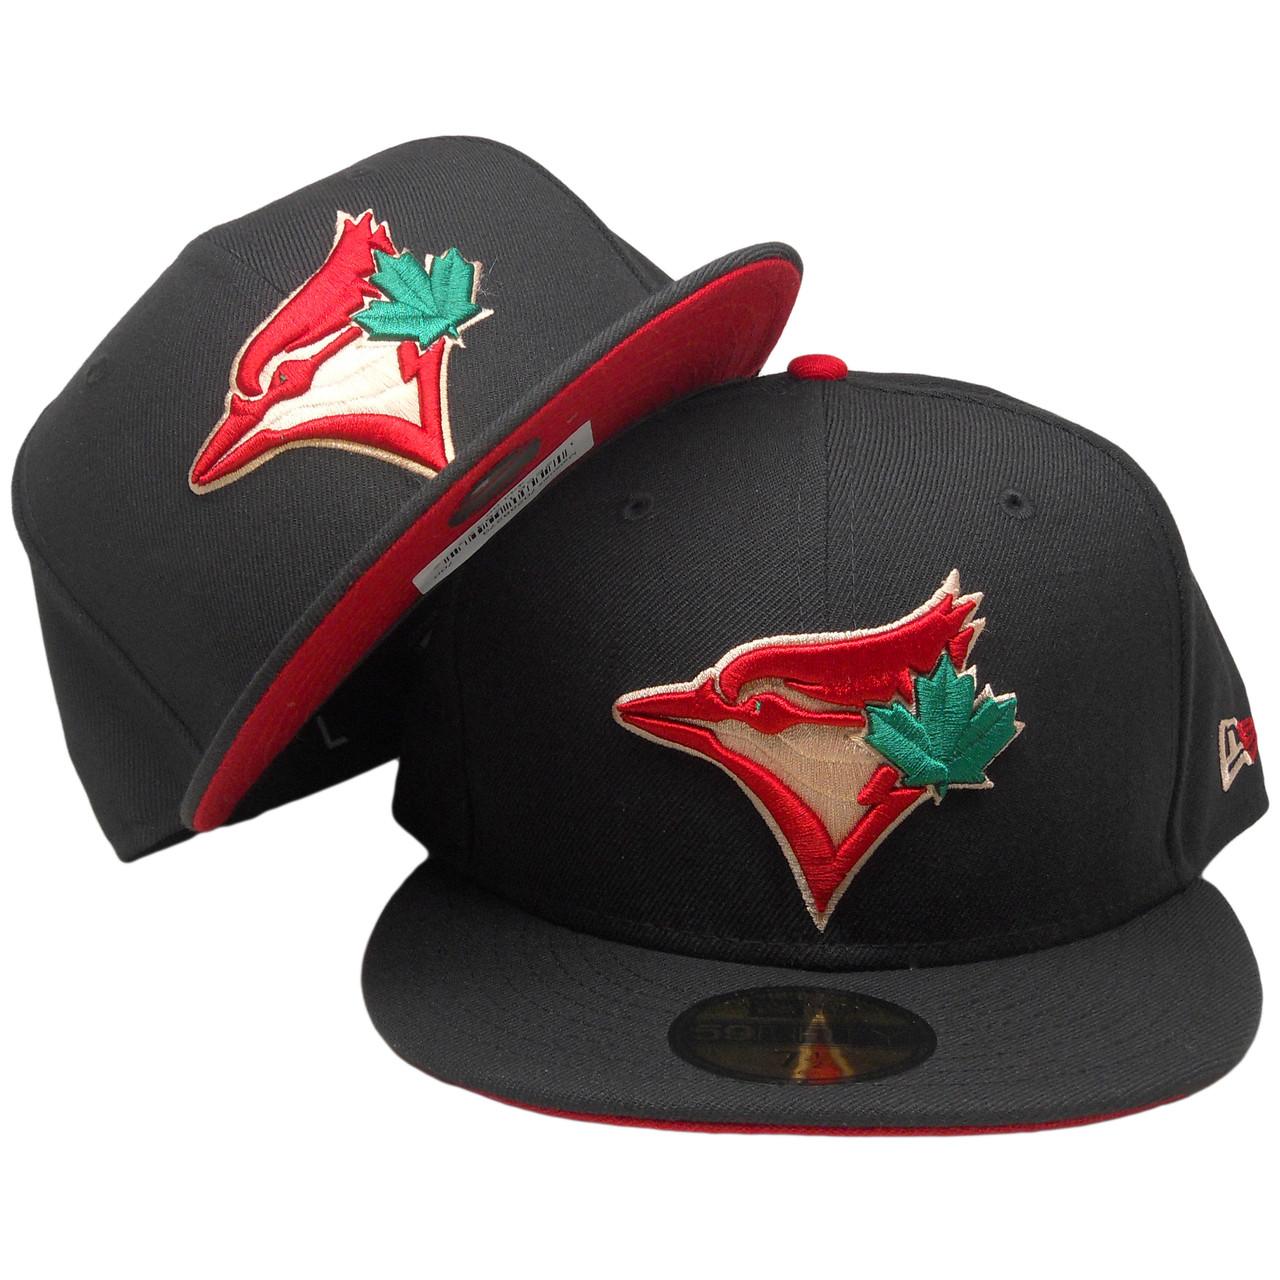 Toronto Blue Jays New Era 59Fifty Custom Fitted Hat - Black 3edc8a7b922